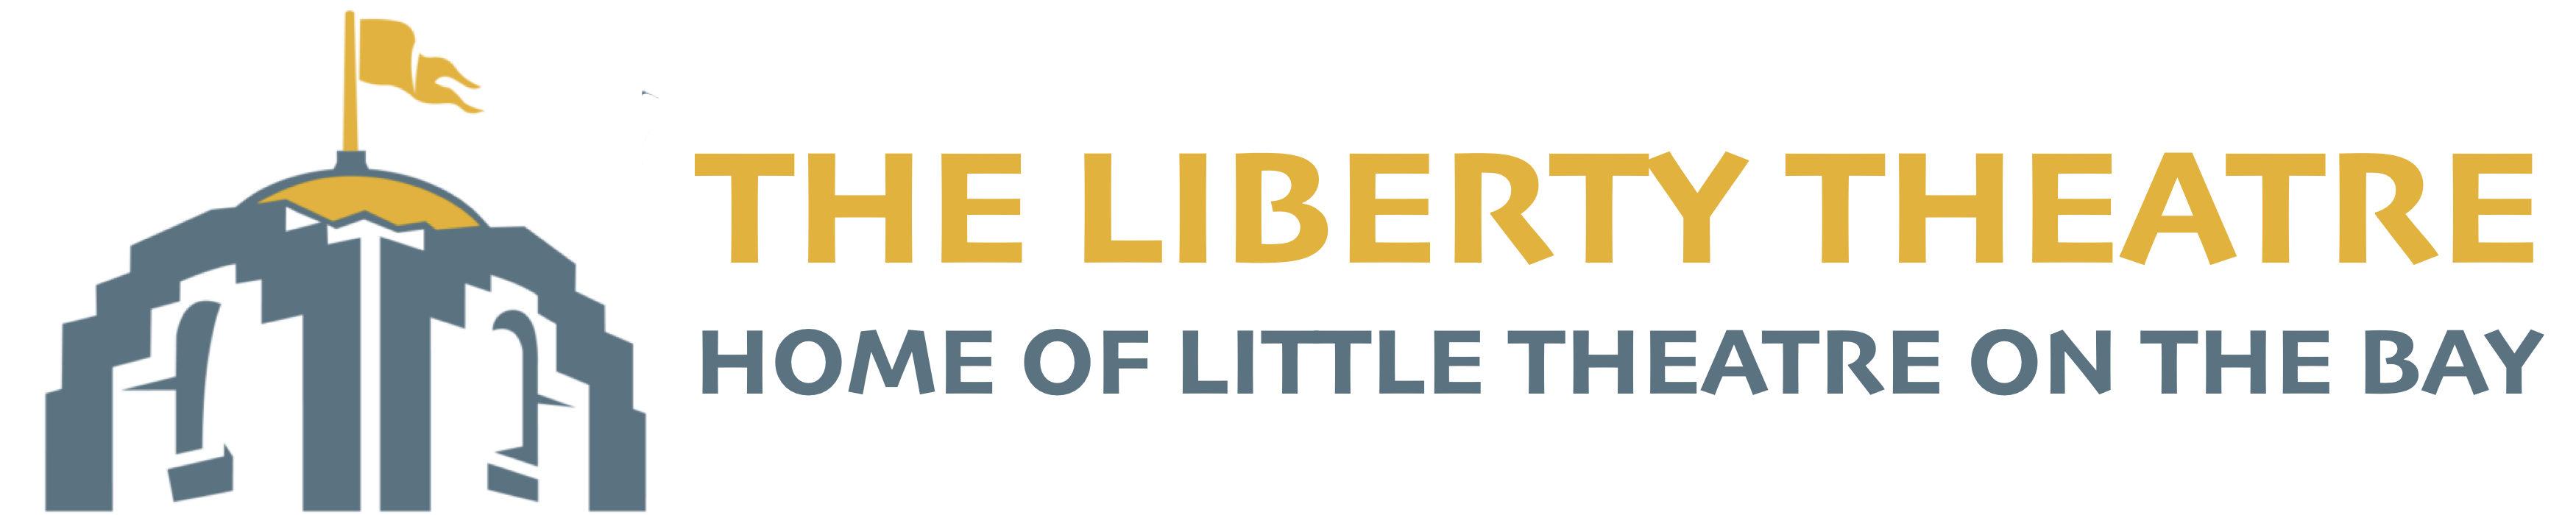 The Liberty Theatre